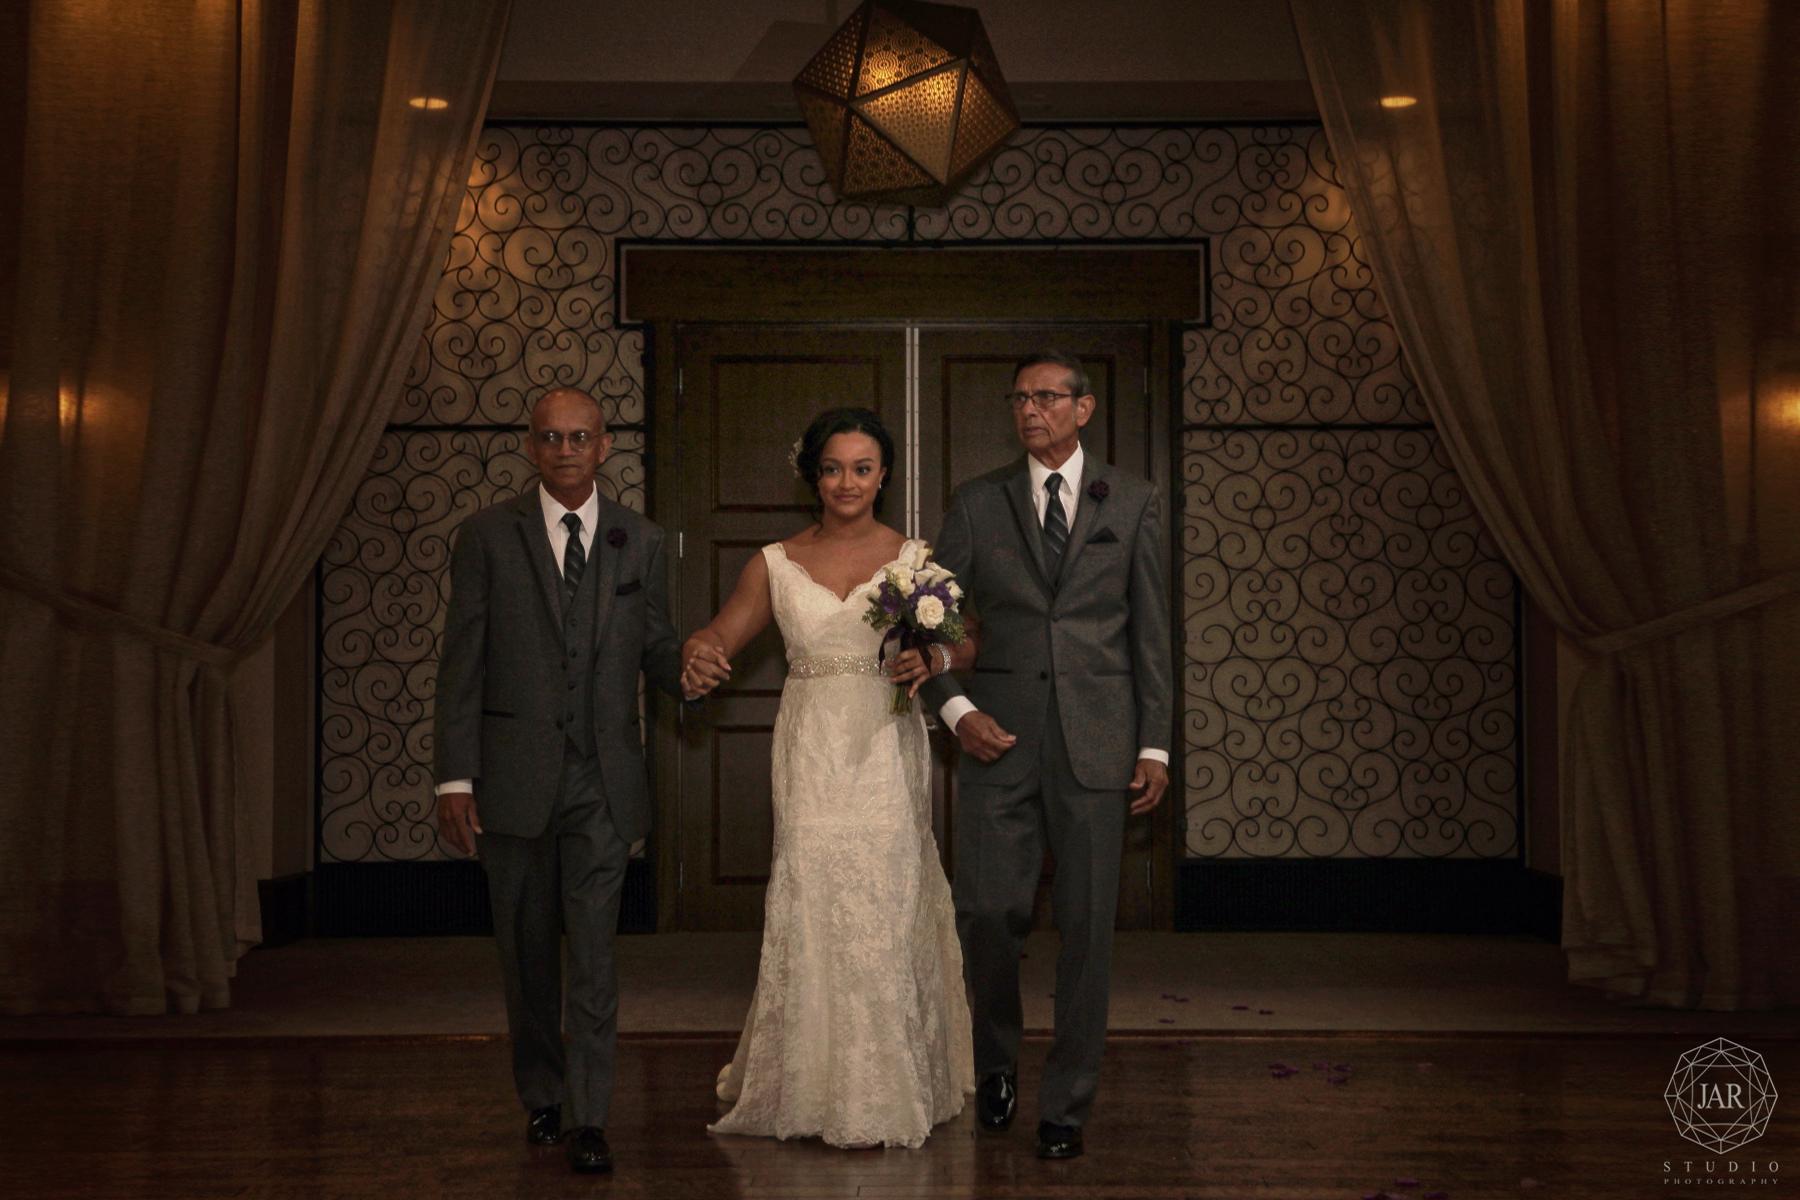 14-bride-ceremony-walking-alfond-inn-jarstudio.JPG